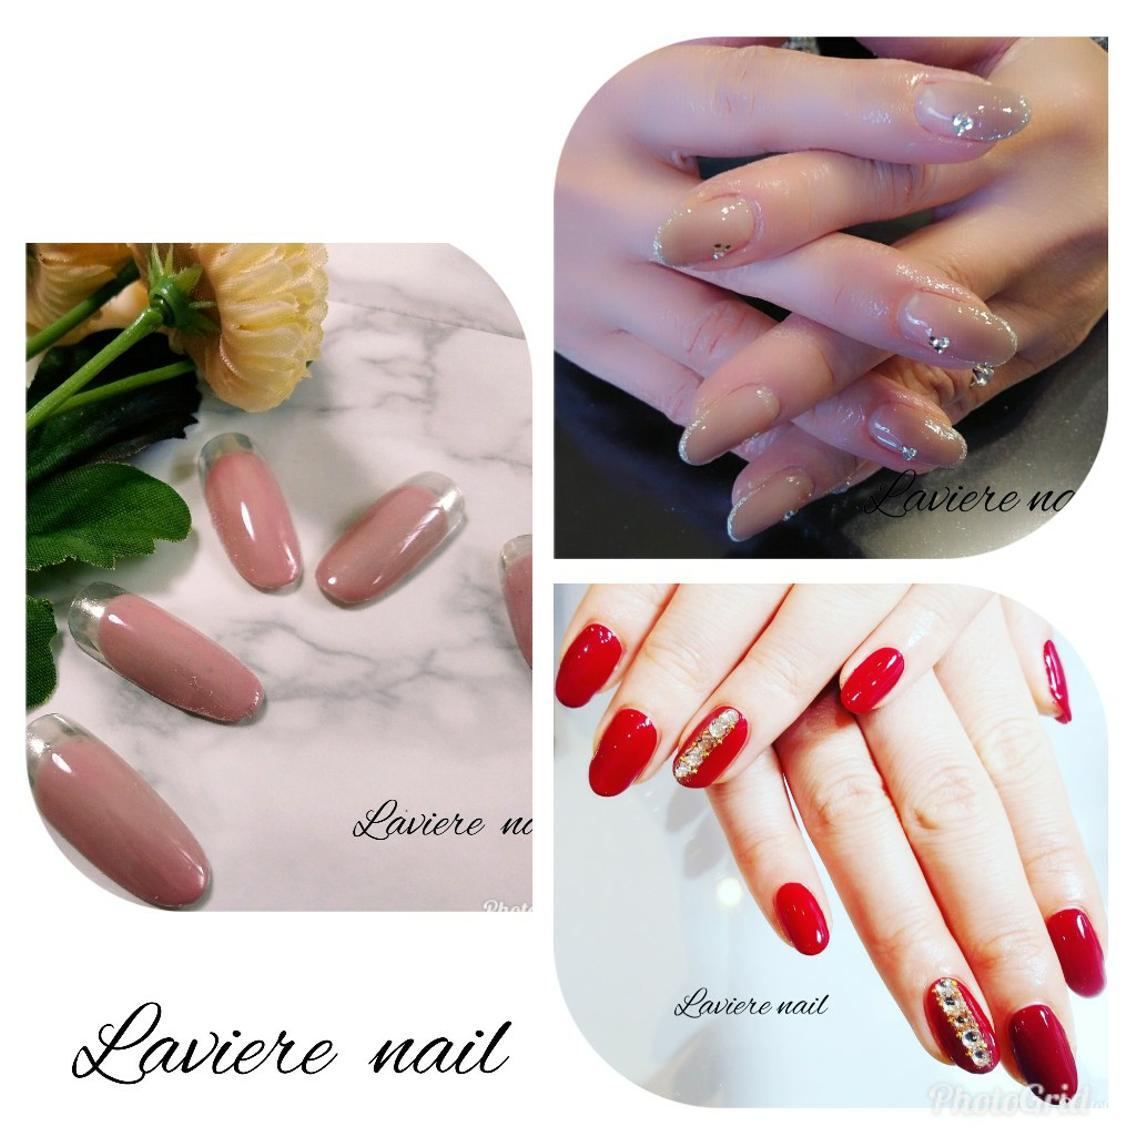 Laviere nail所属・Laviere nailの掲載